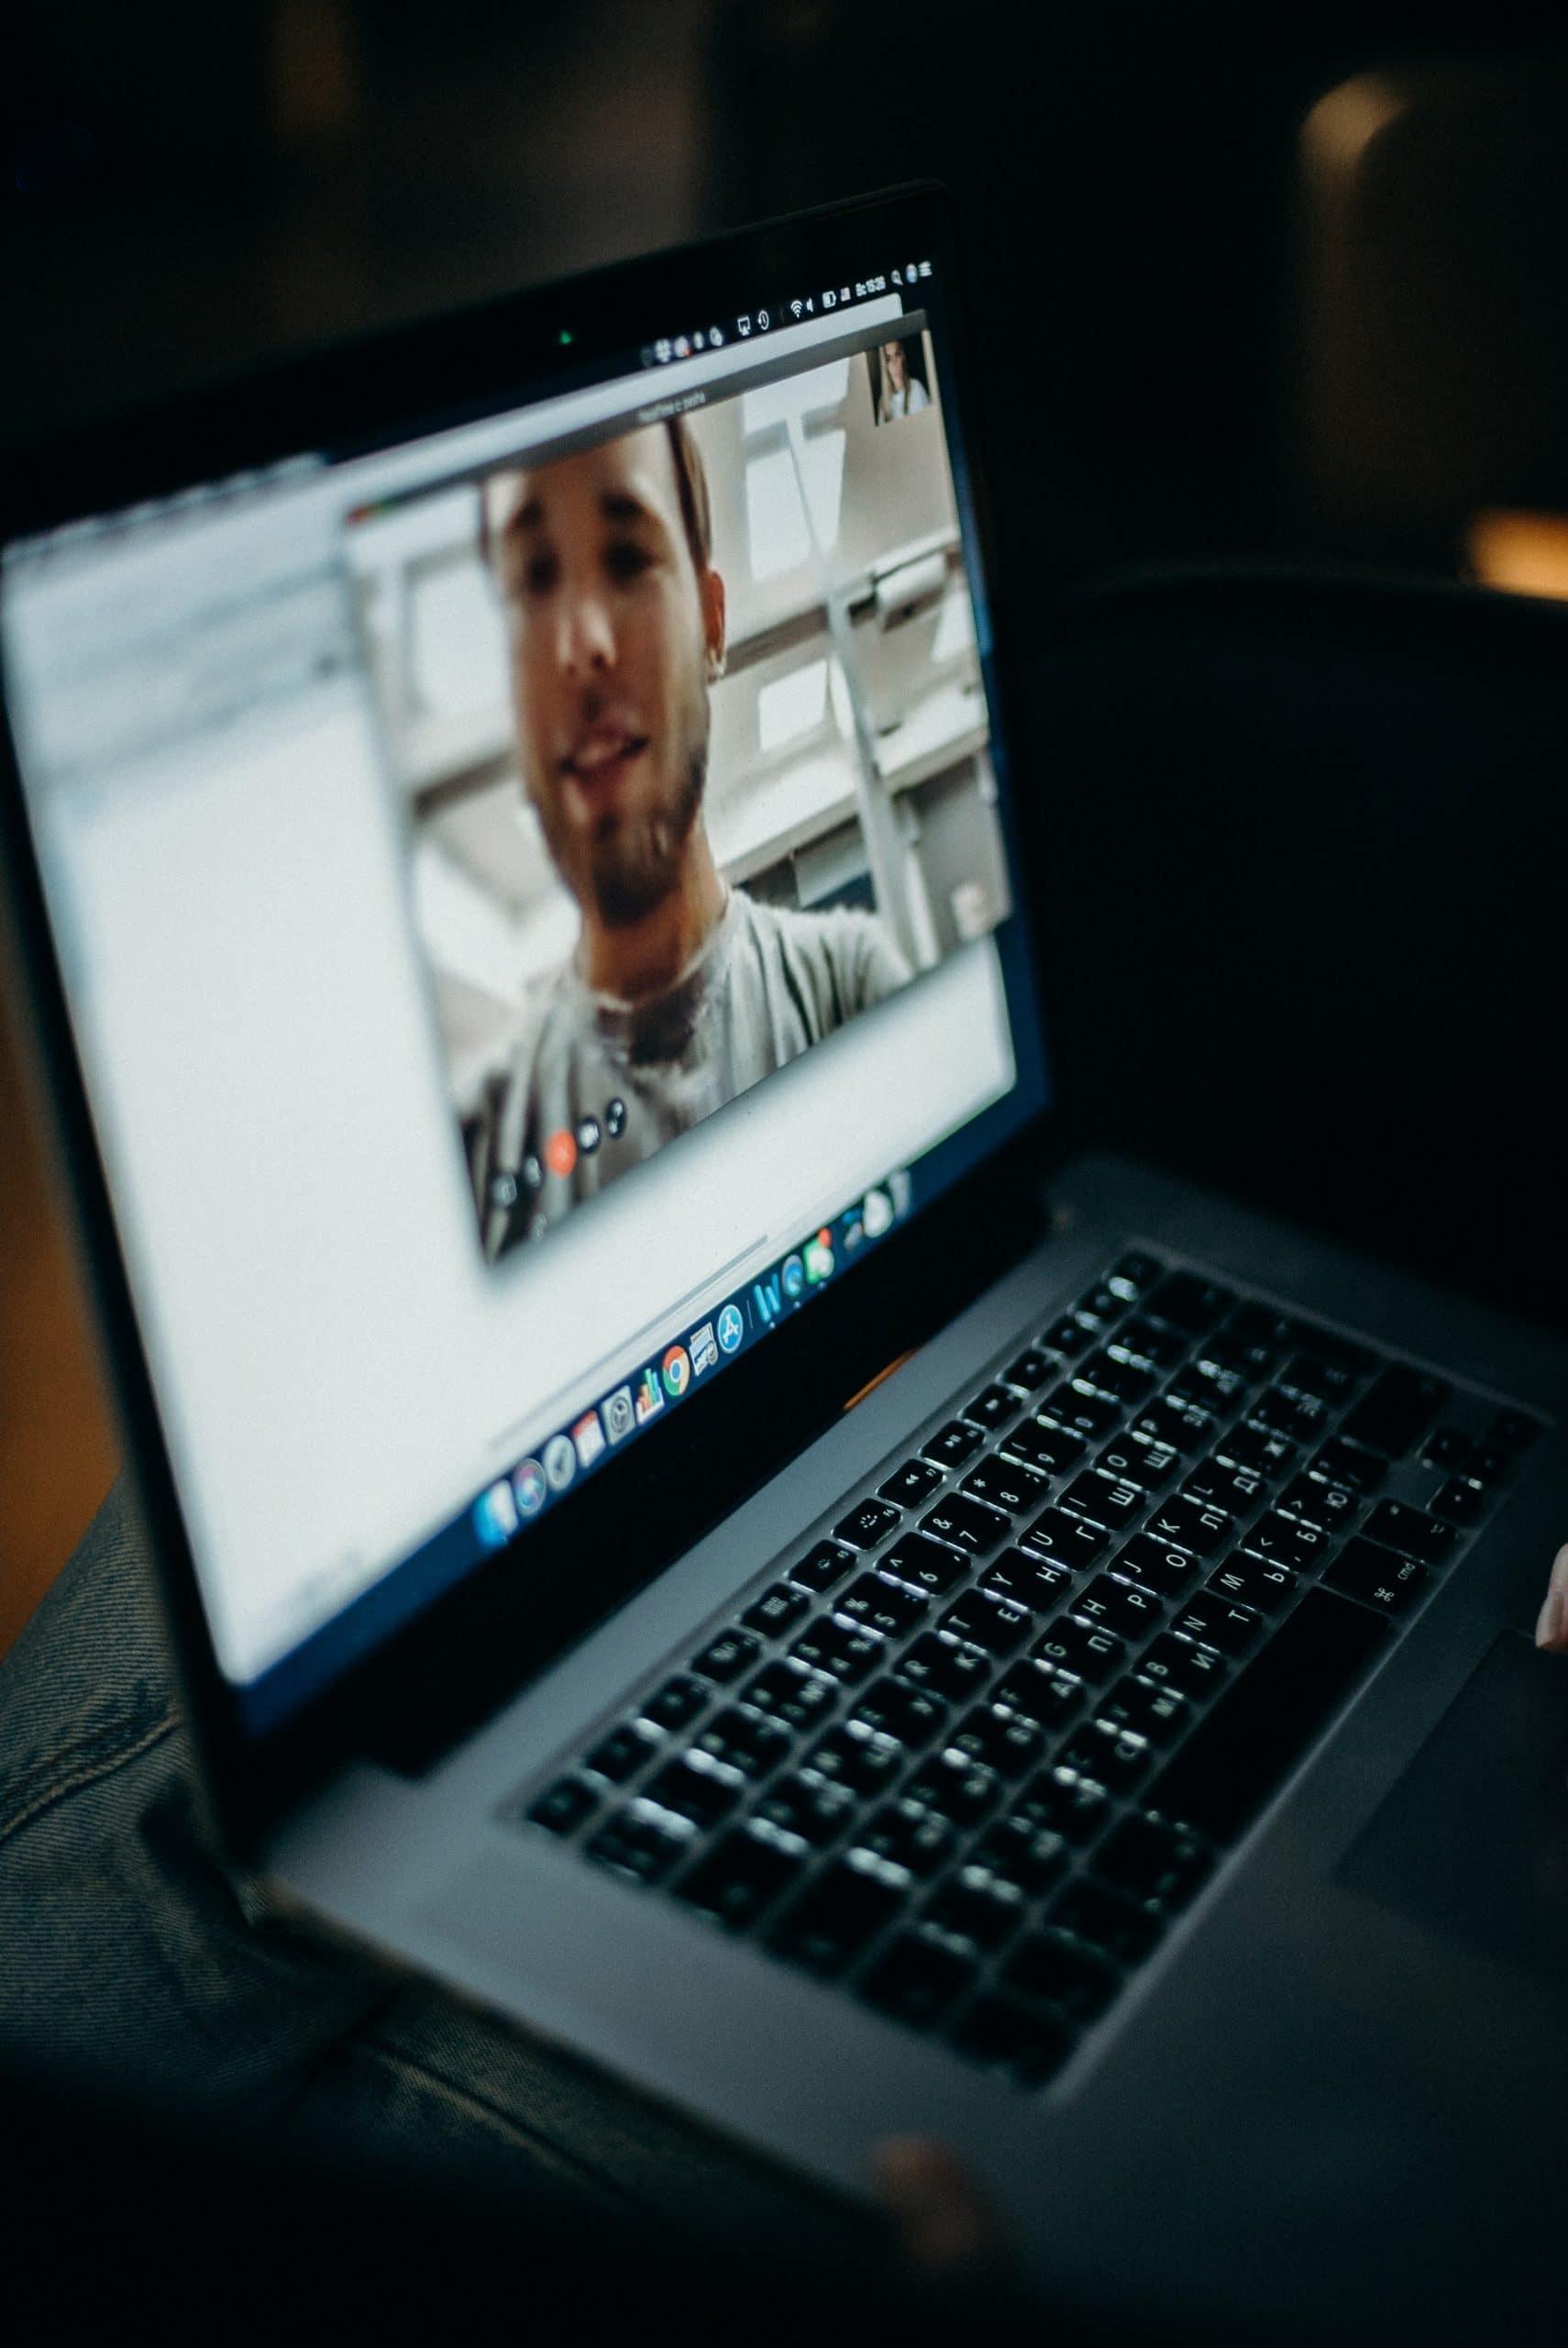 Meeting via Video Call untuk kontroling kinerja karyawan saat work from home